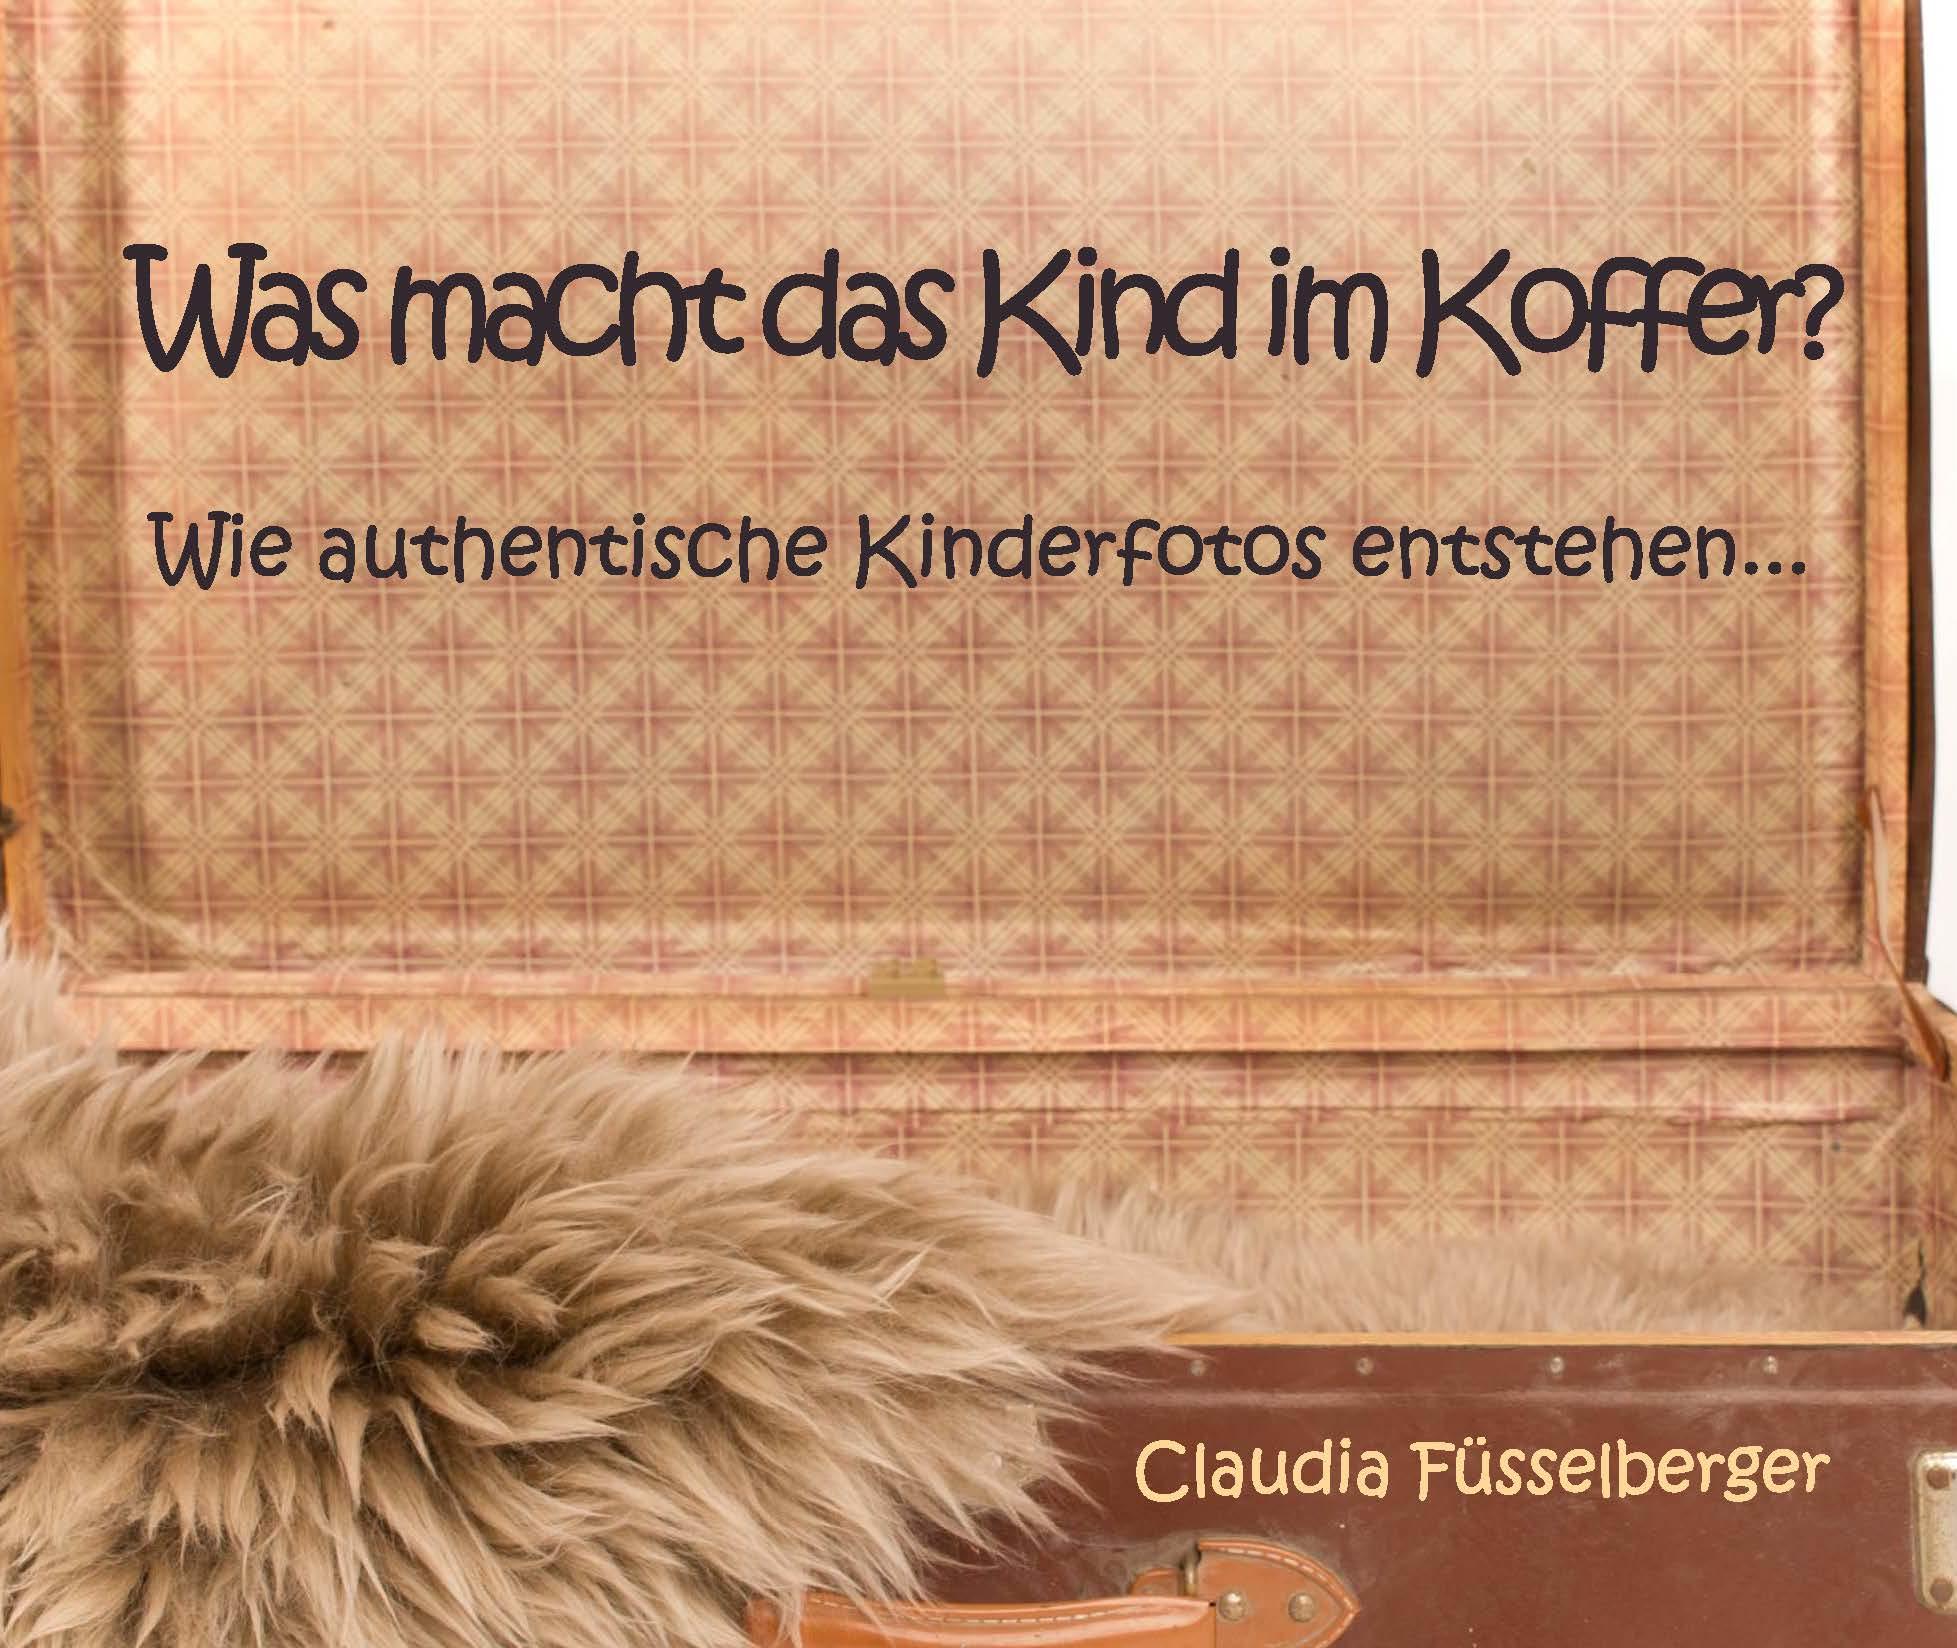 Copyright by Claudia Füsselberger